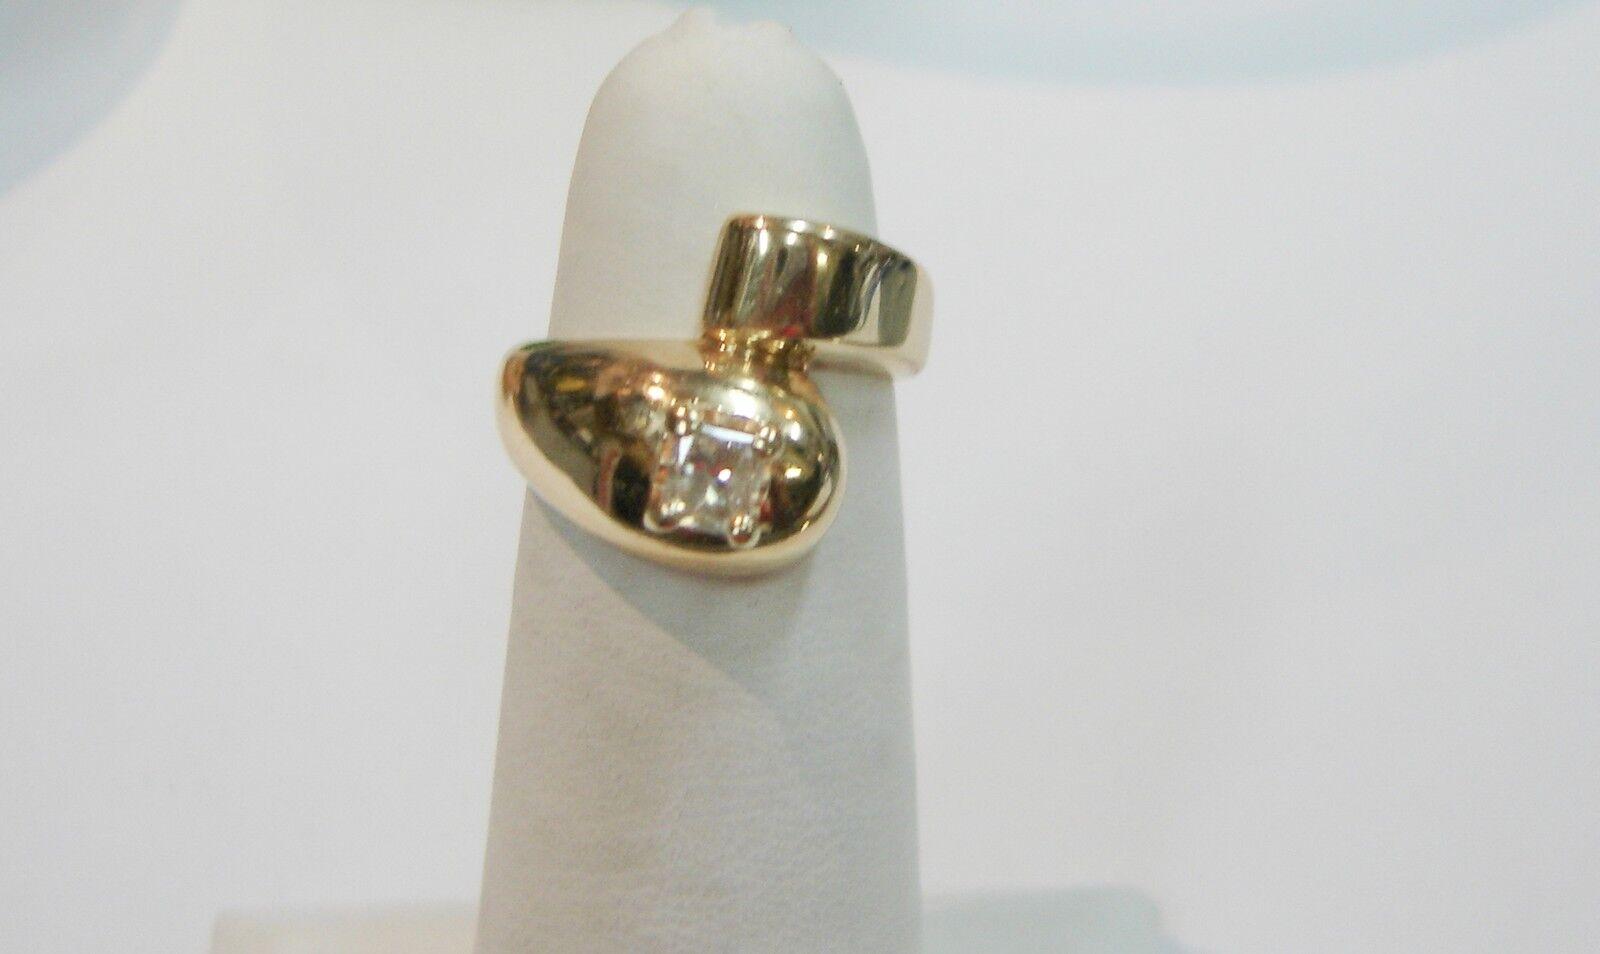 14K YELLOW gold SOLITAIRE PRINCESS CUT DIAMOND RING SIZE 4 3 4-5 N238-K